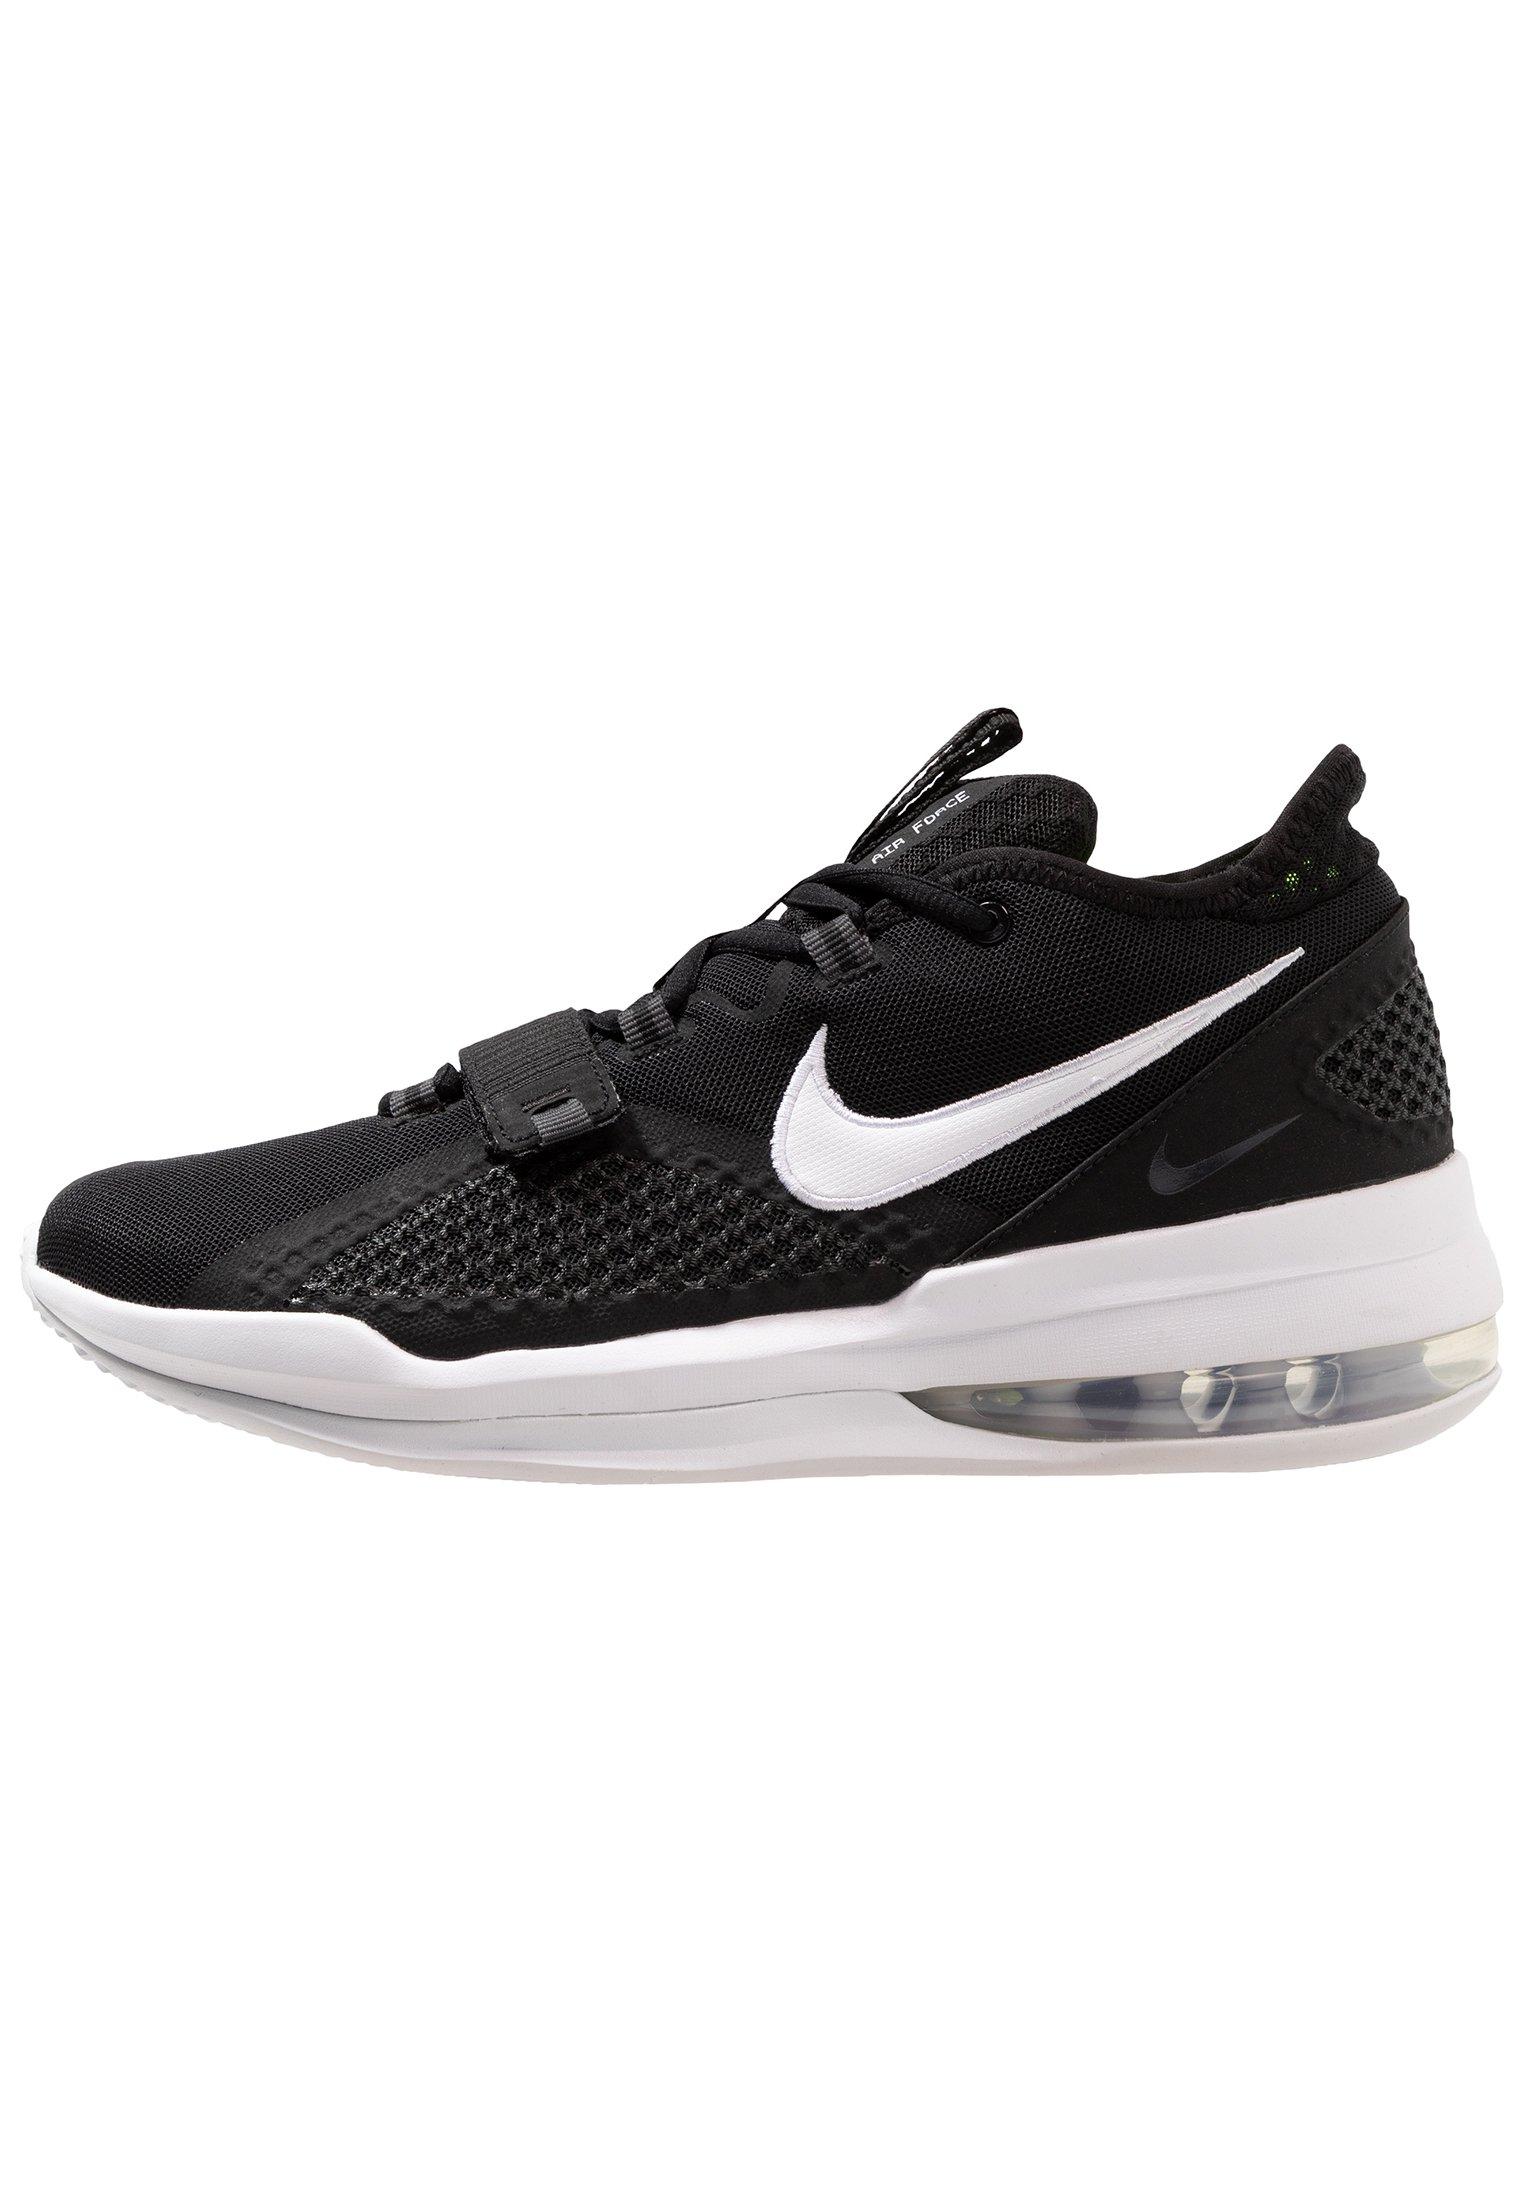 AIR FORCE MAX LOW Chaussures de basket blackwhitevolt